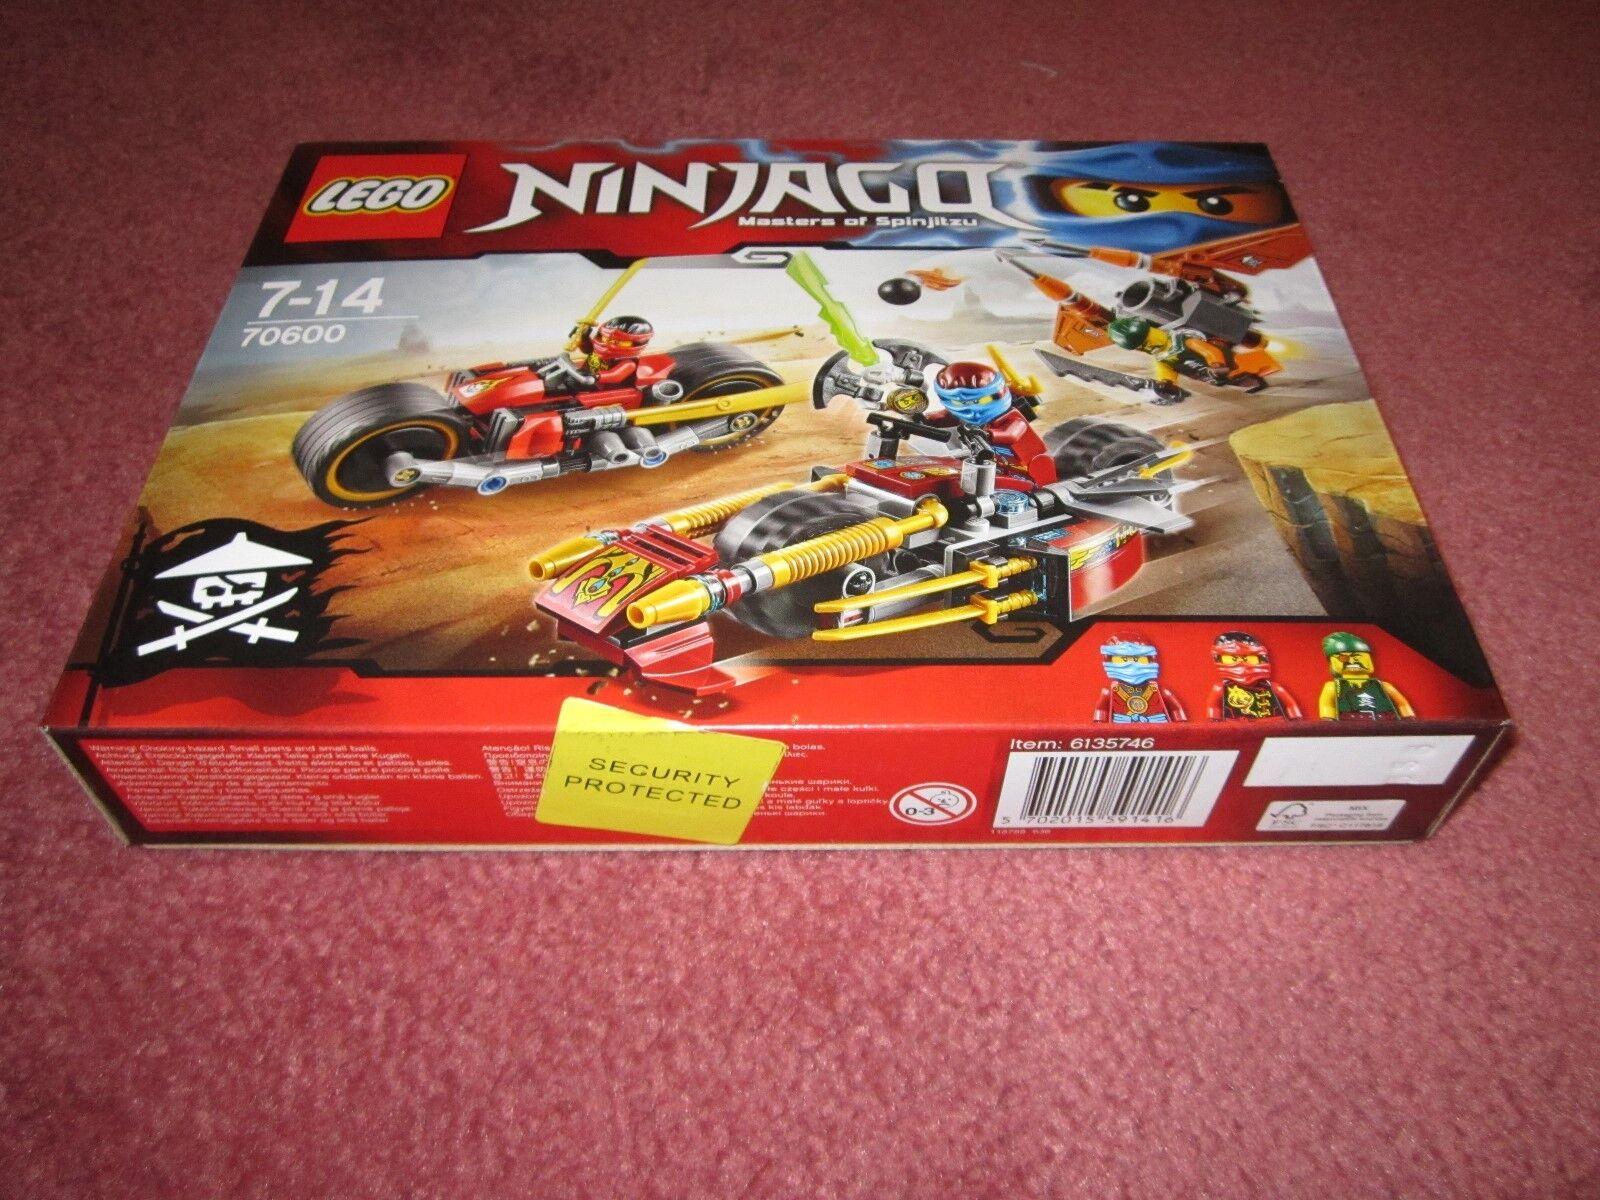 LEGO NINJAGO NINJA BIKE CHASE 70600 - NEW BOXED SEALED